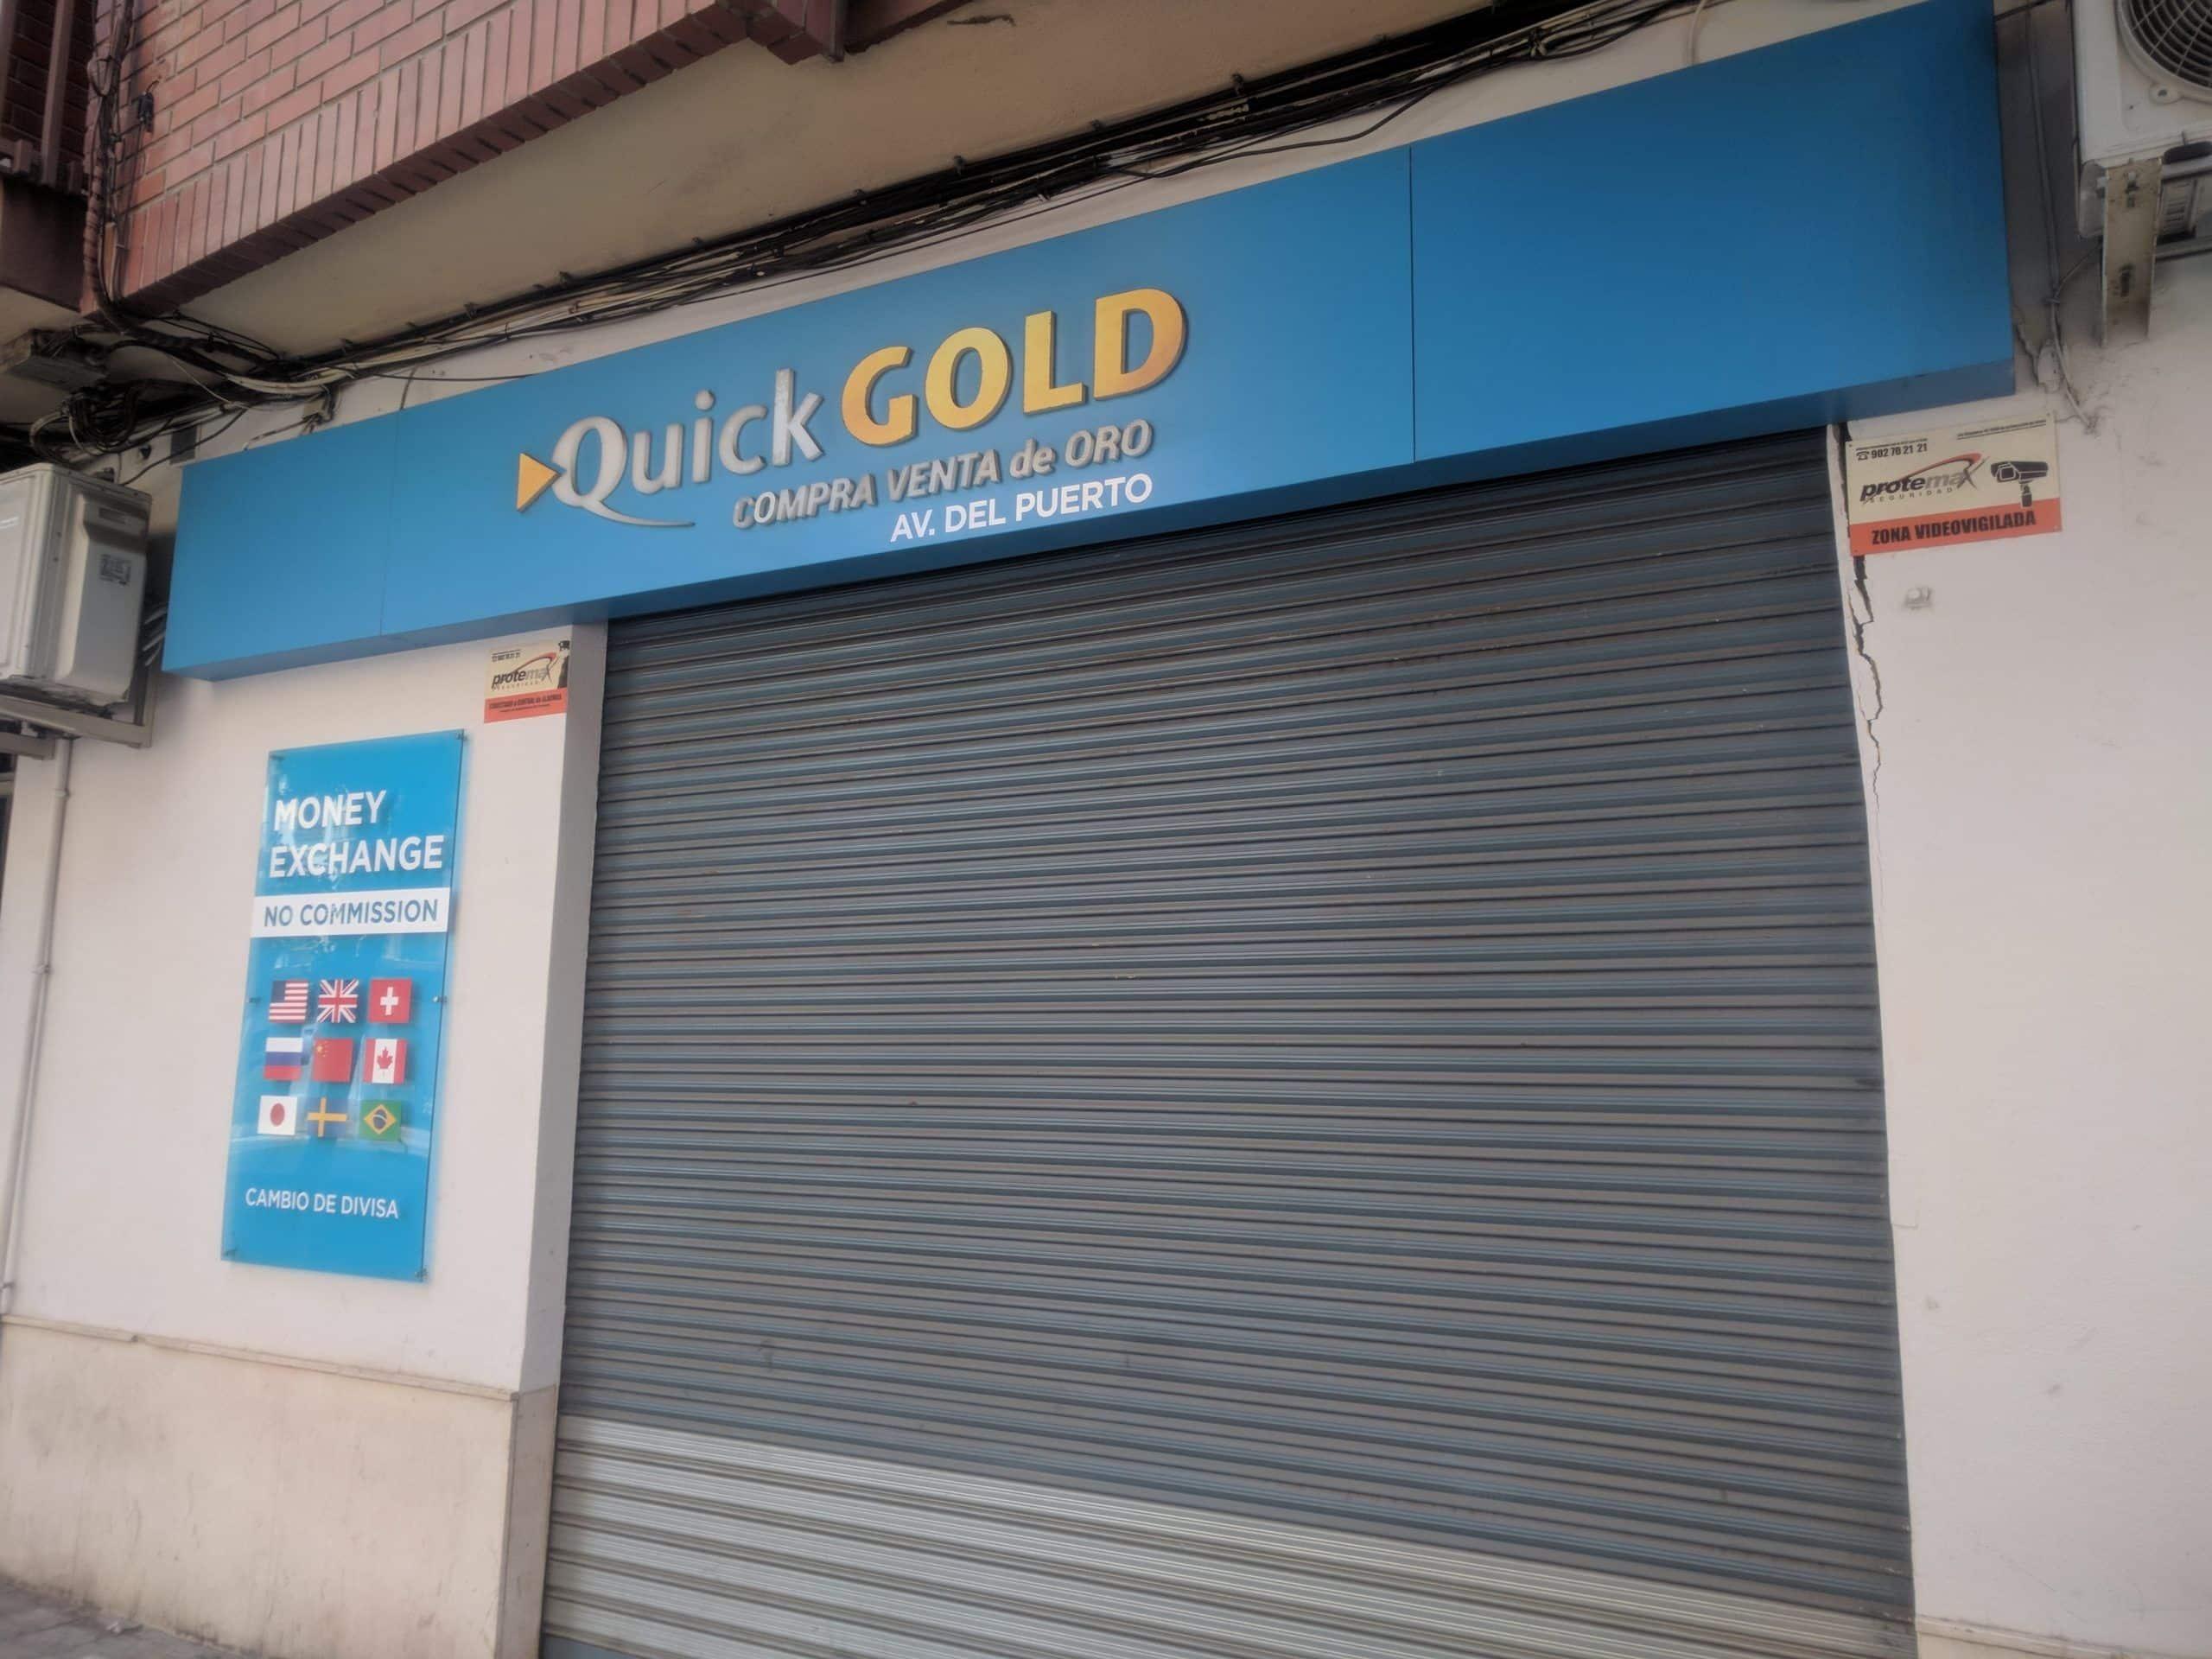 Tienda Quickgold Avenida del Puerto